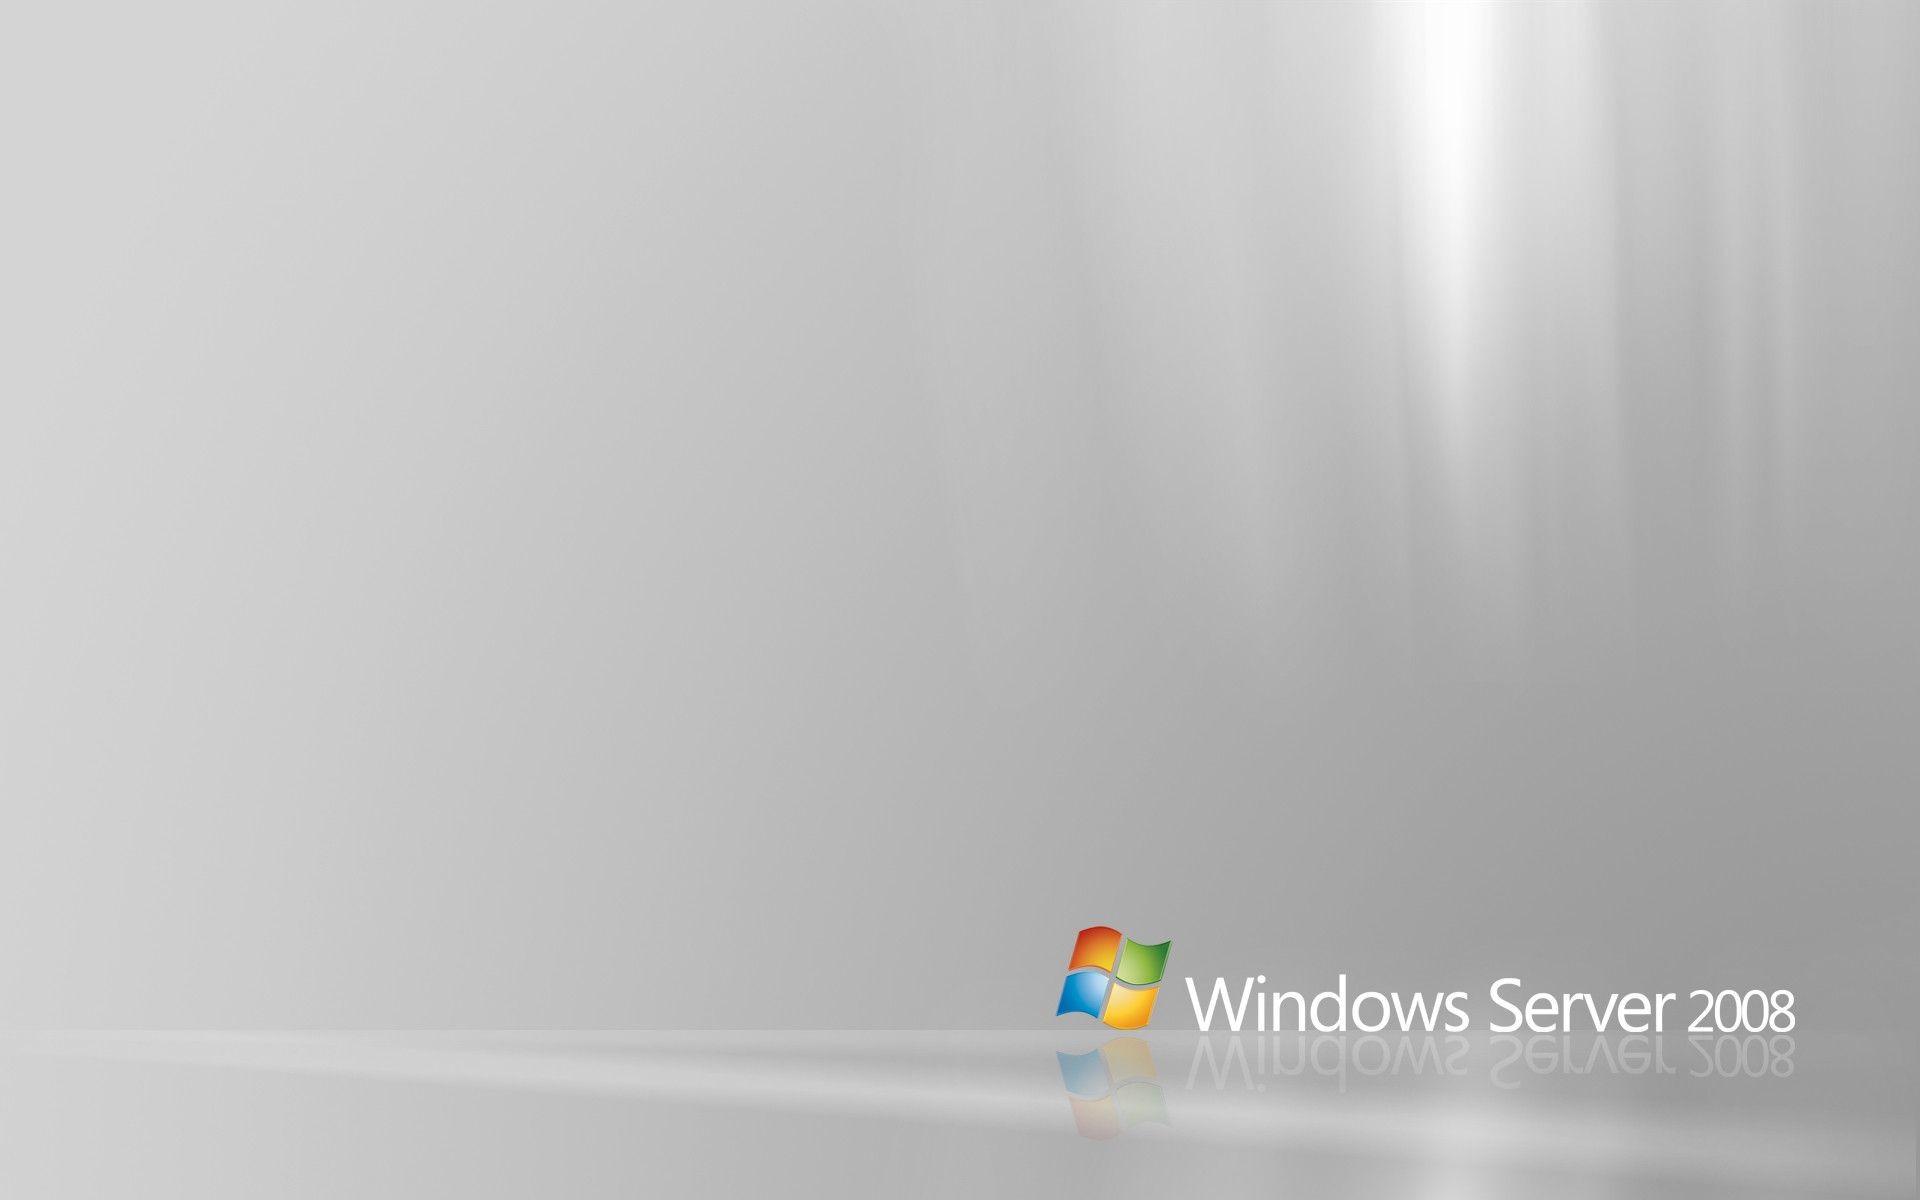 Windows Server Wallpaper Collection Windows Server 1920×1200